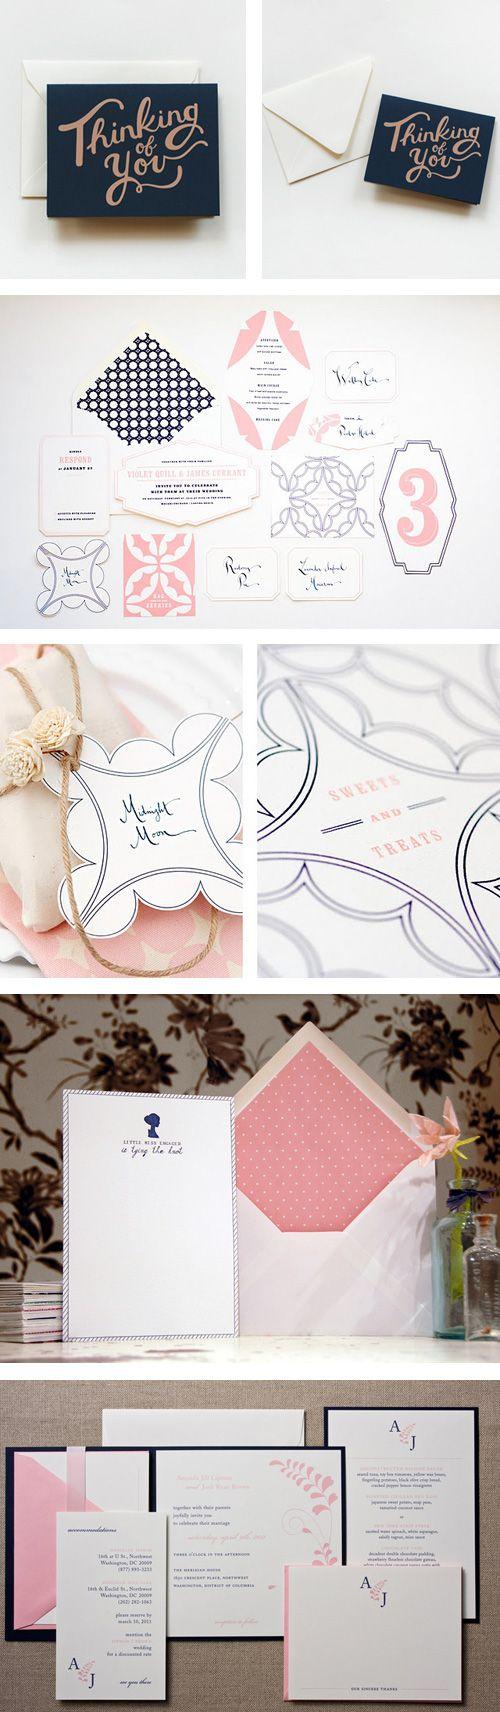 Adore these navy and pink wedding invitations #maggiespantonepicks